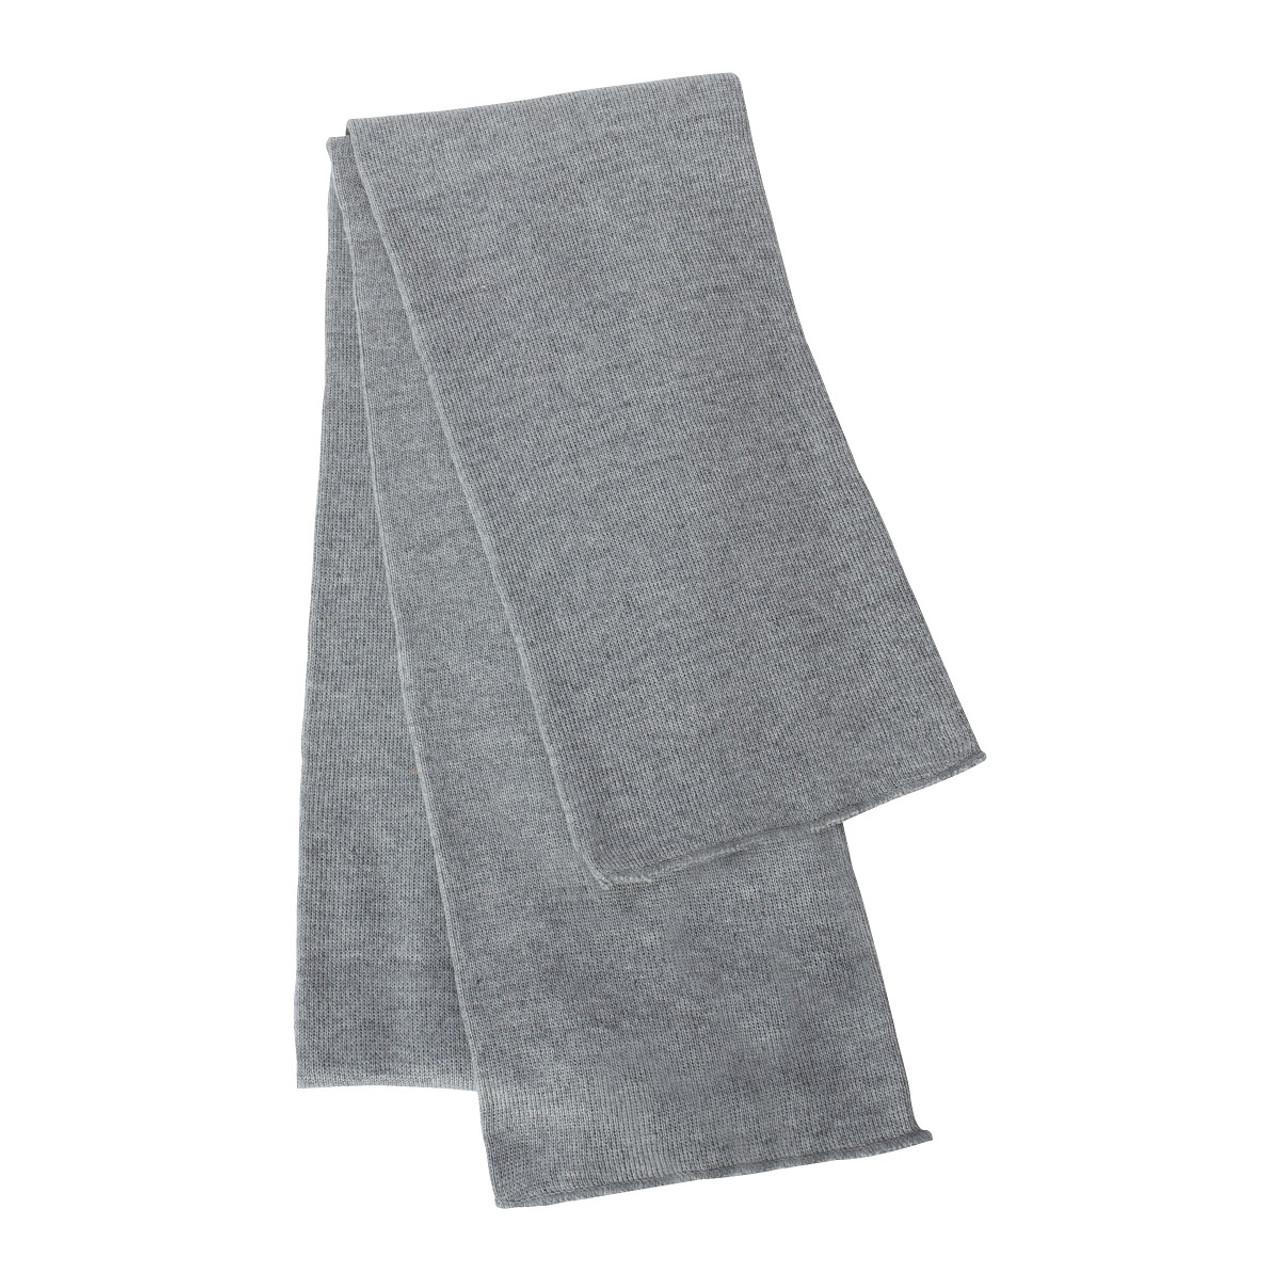 Heather Grey - SP04 Sportsman Knit Scarf | T-shirt.ca